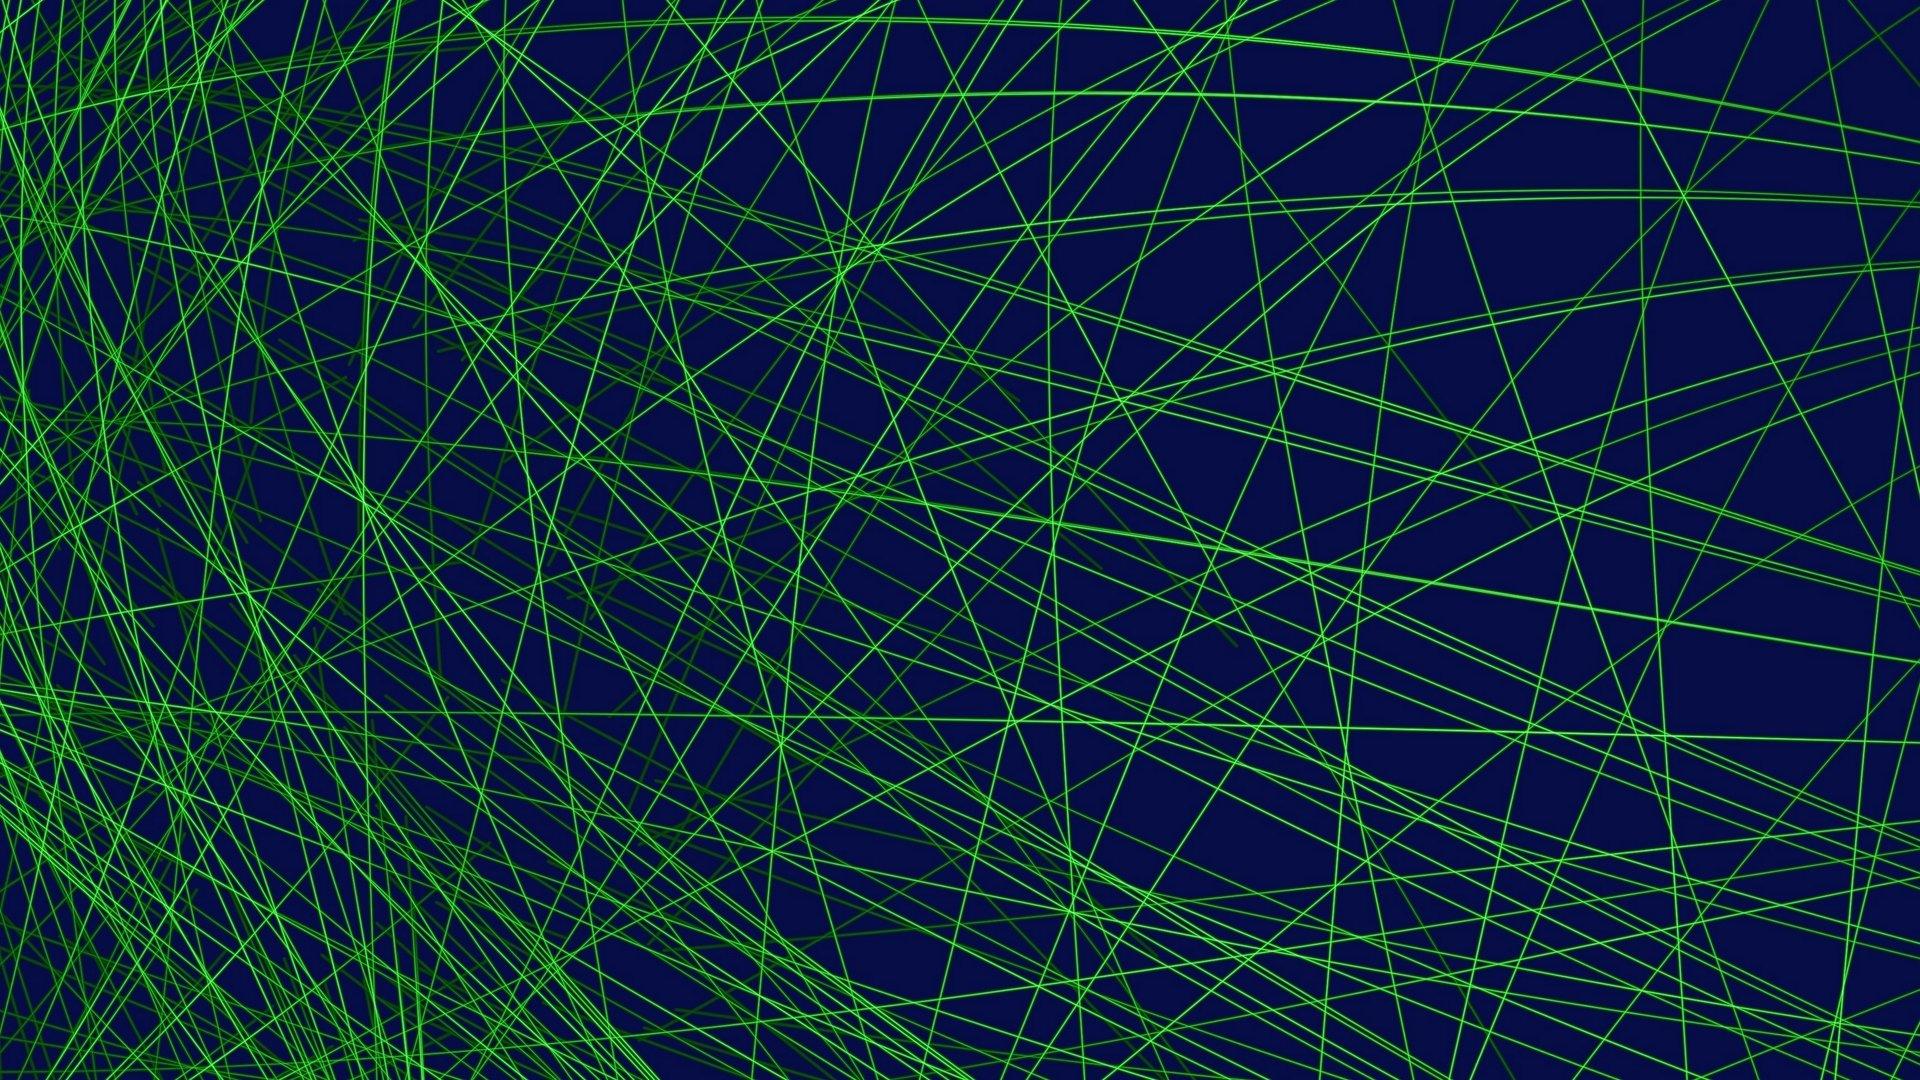 Plexus Image HD